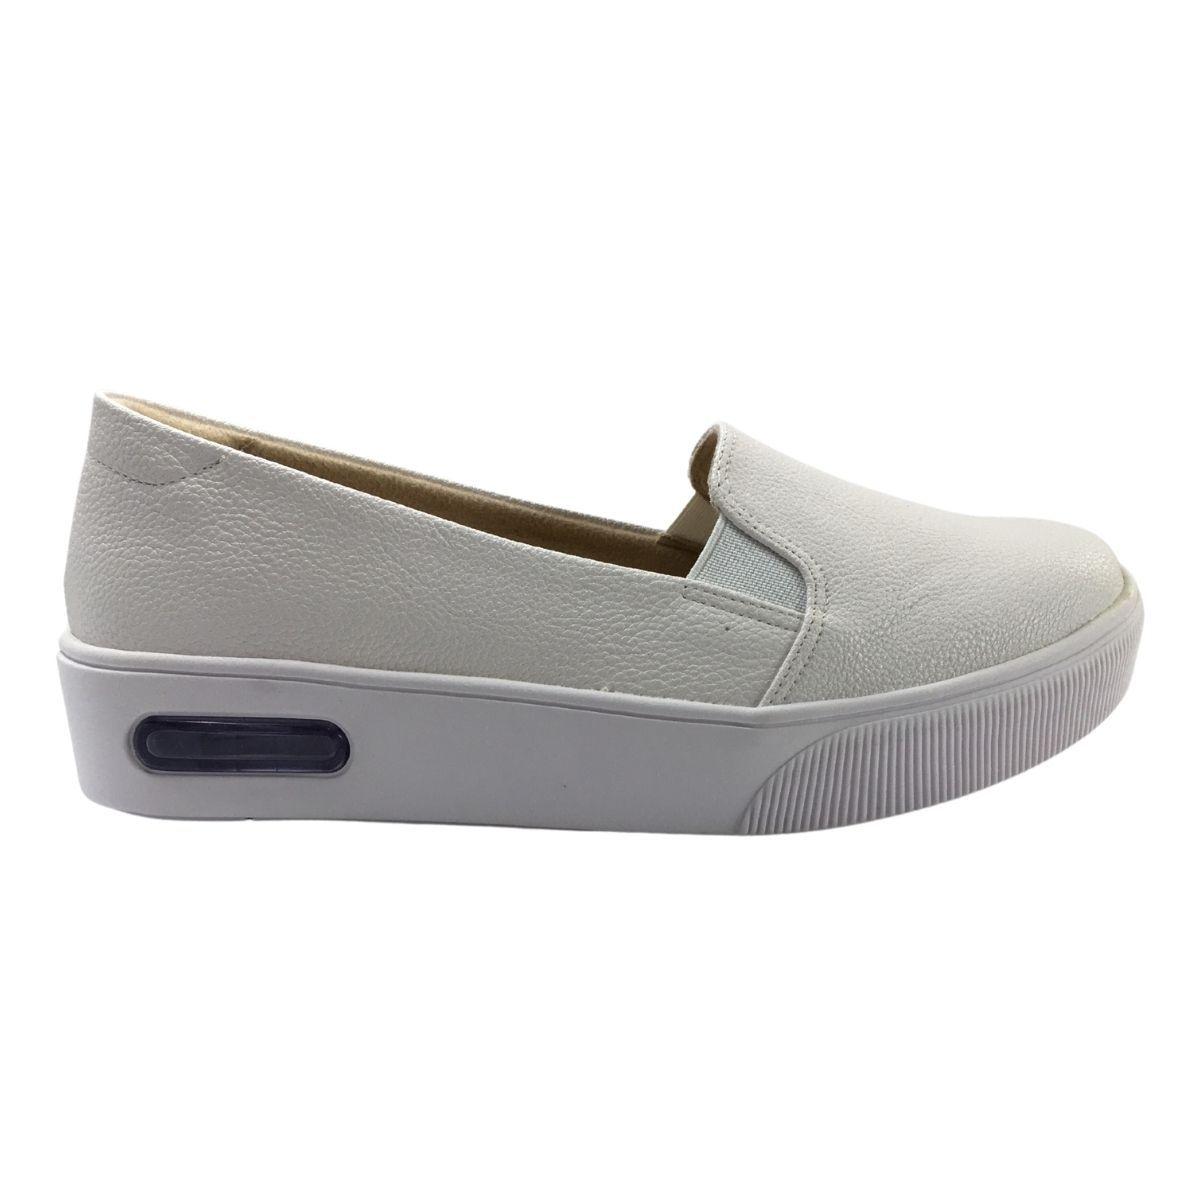 Sapato Feminino Modare Slip On Confortável Couro Anatômico